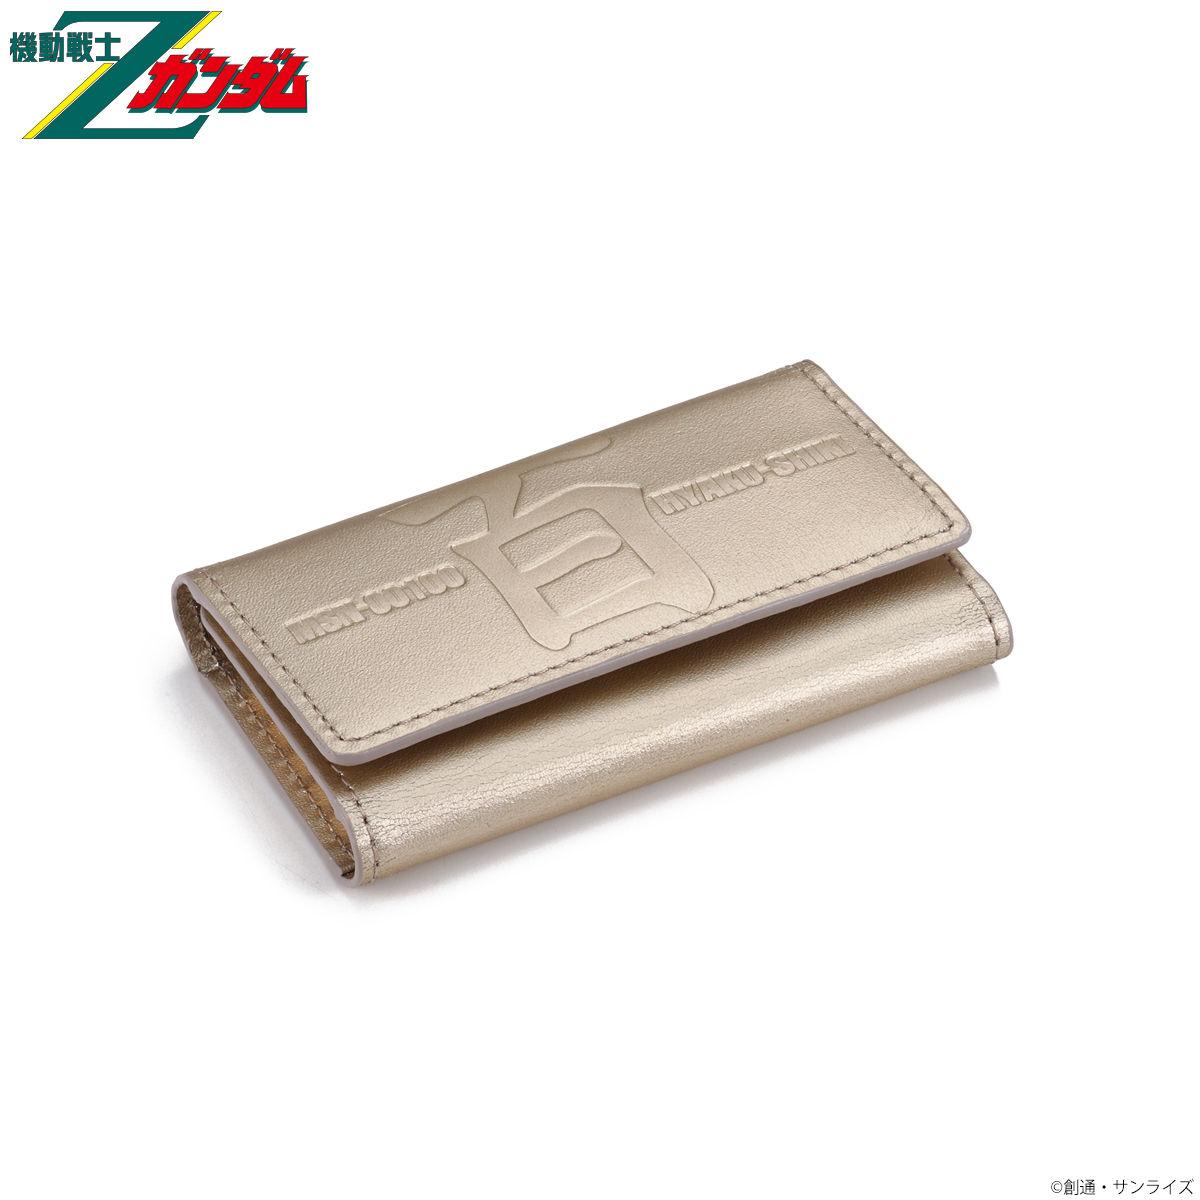 Mobile Suit Zeta Gundam MSN-00100 Key Case